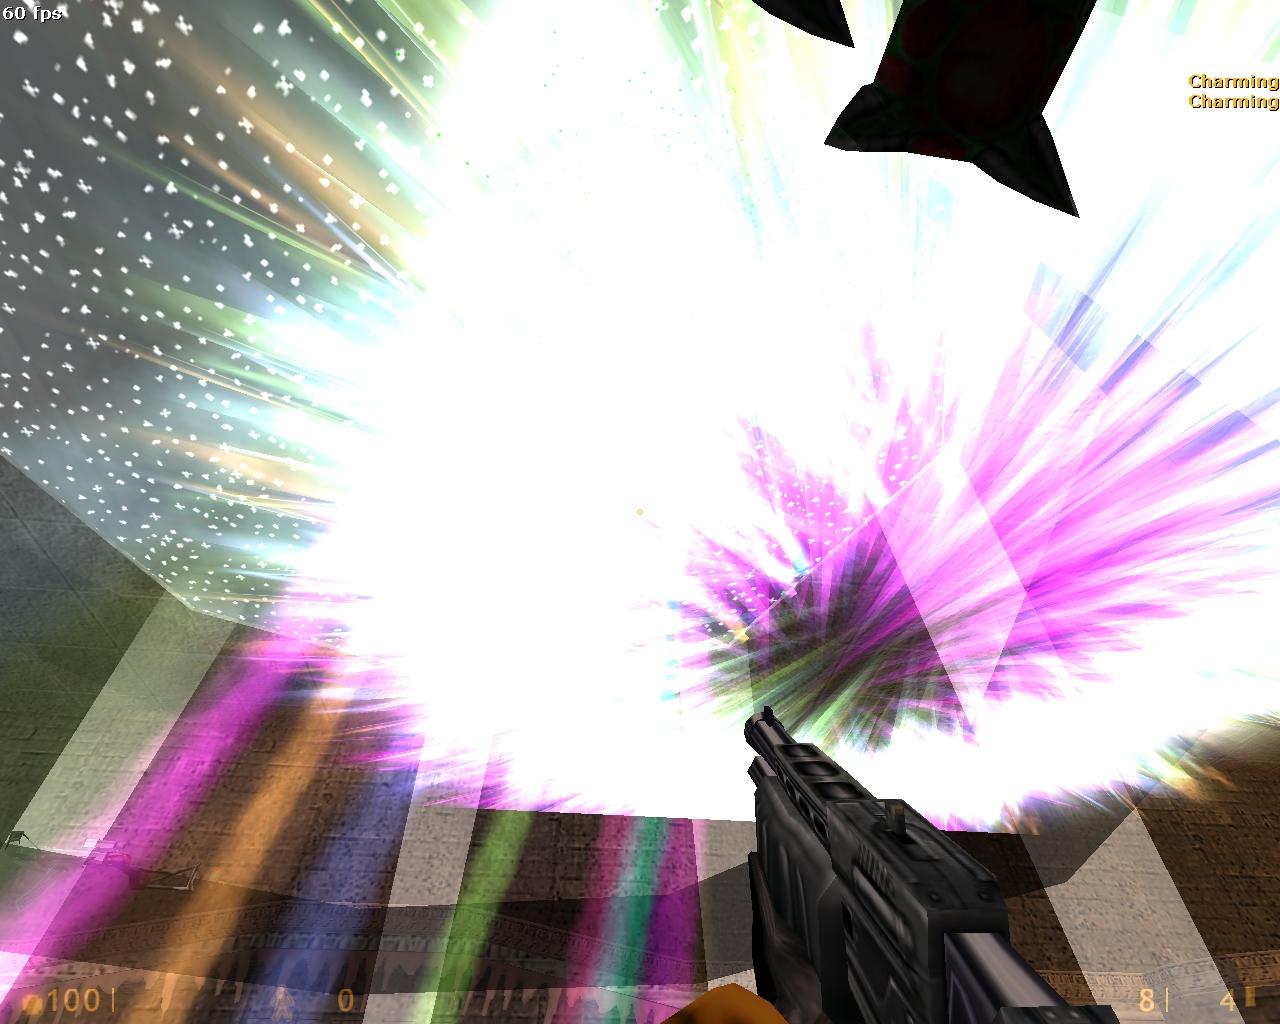 hq_firstblood0001.jpg - Half-Life